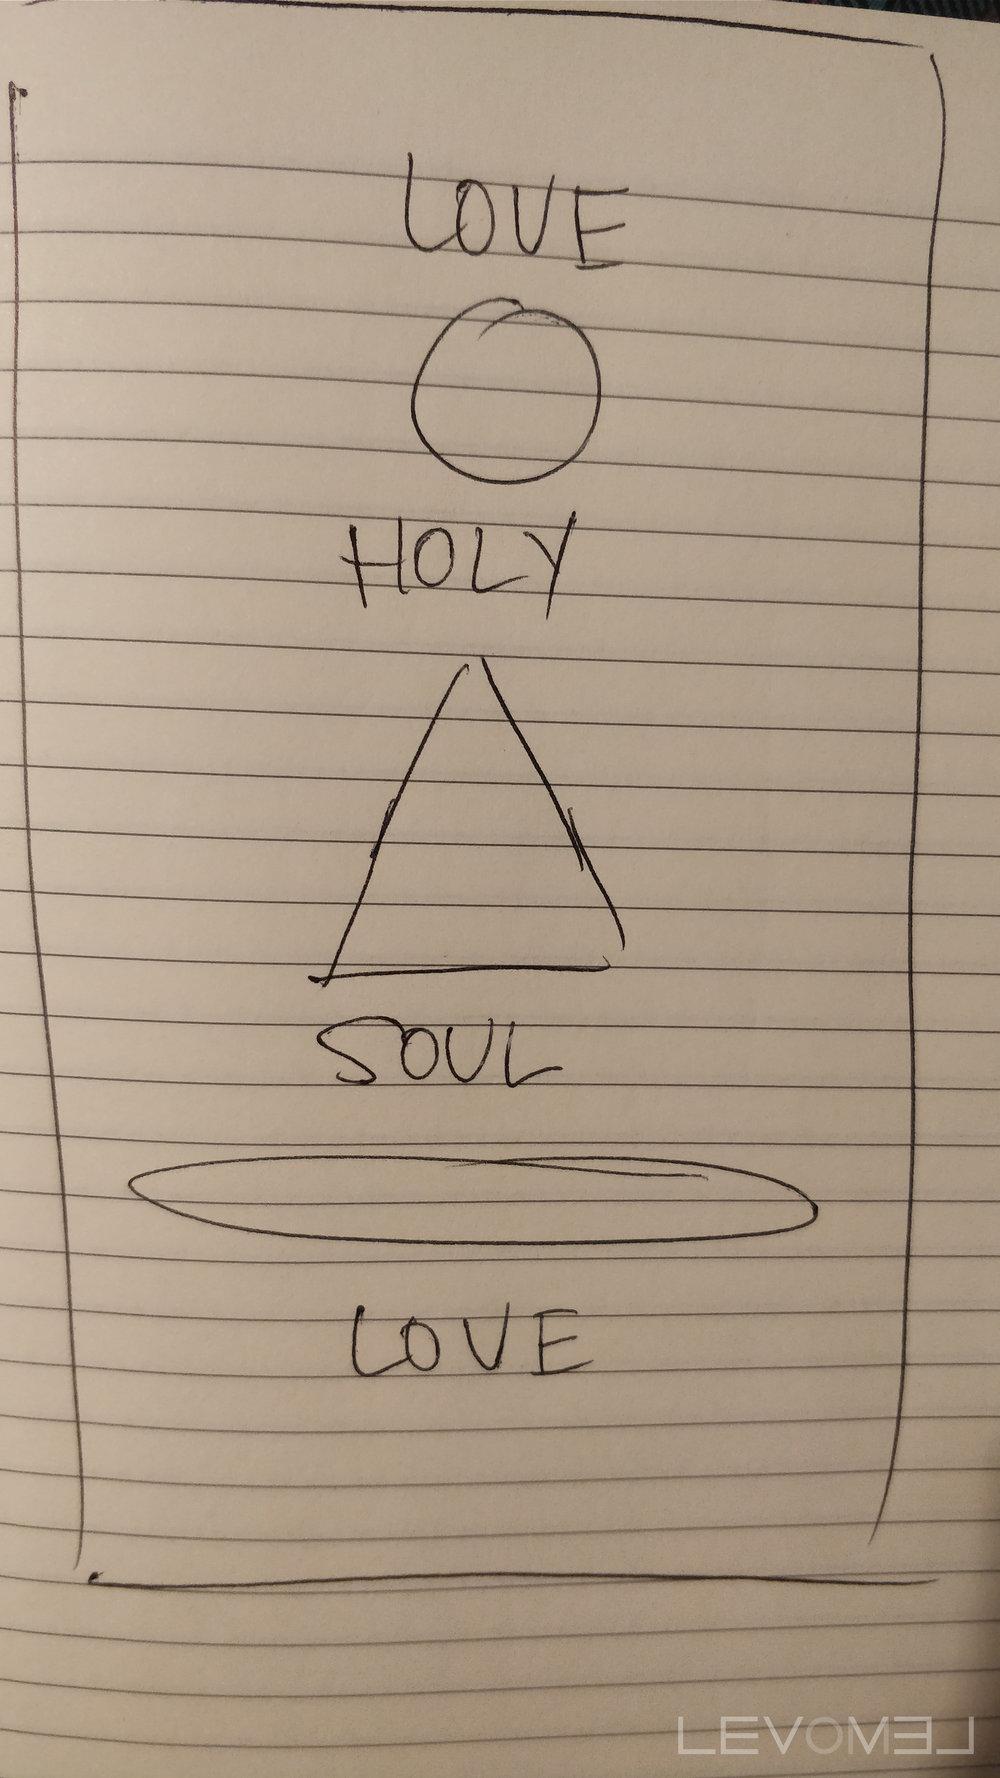 Love Holy Soul Love